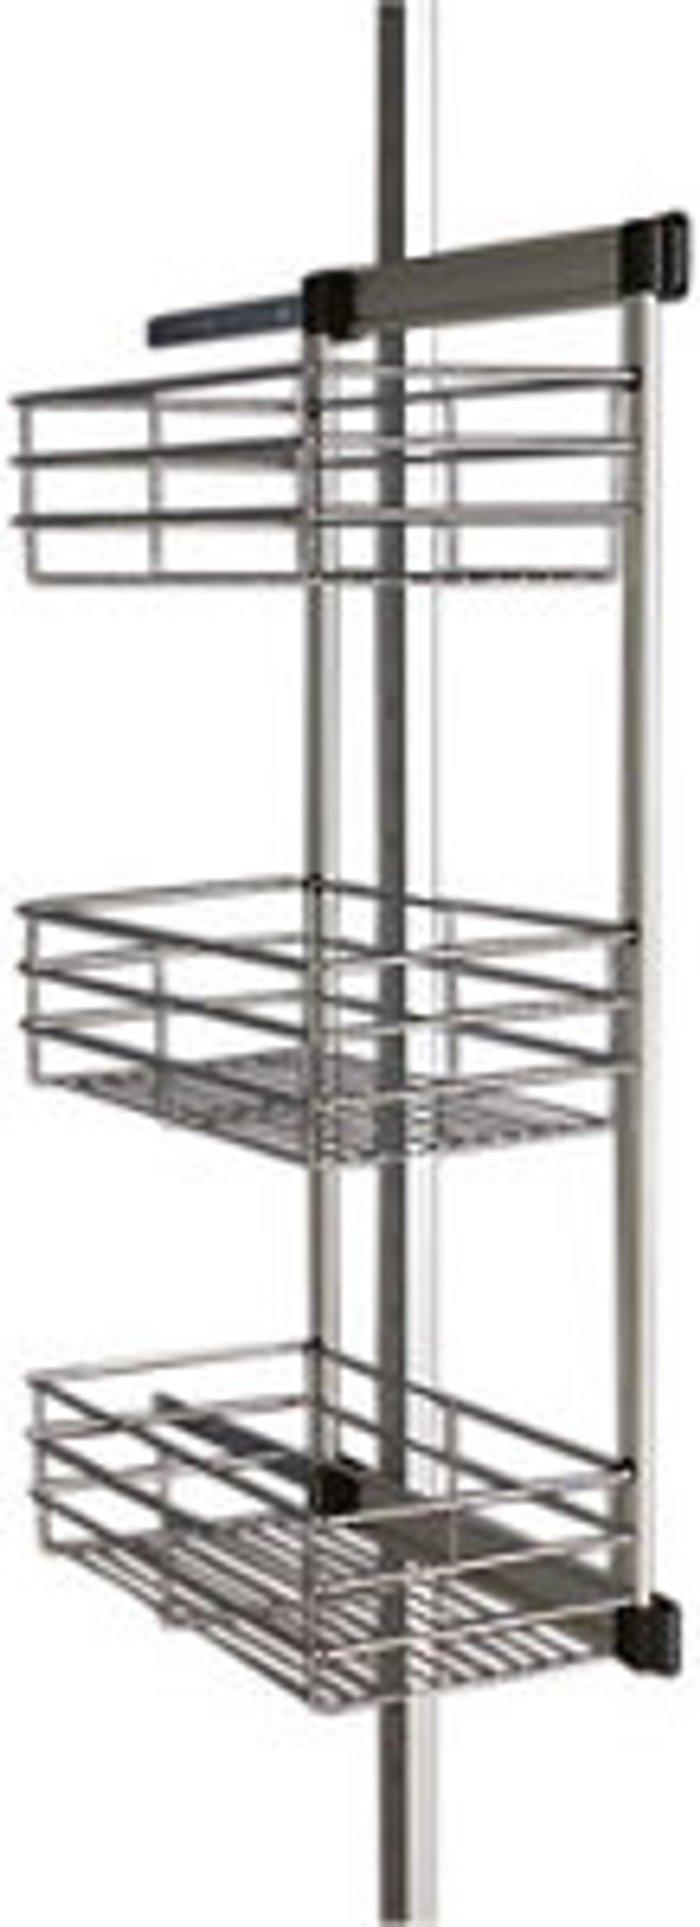 Spacepro Spacepro Aura Basket rack (H)985mm (W)460mm (D)460mm